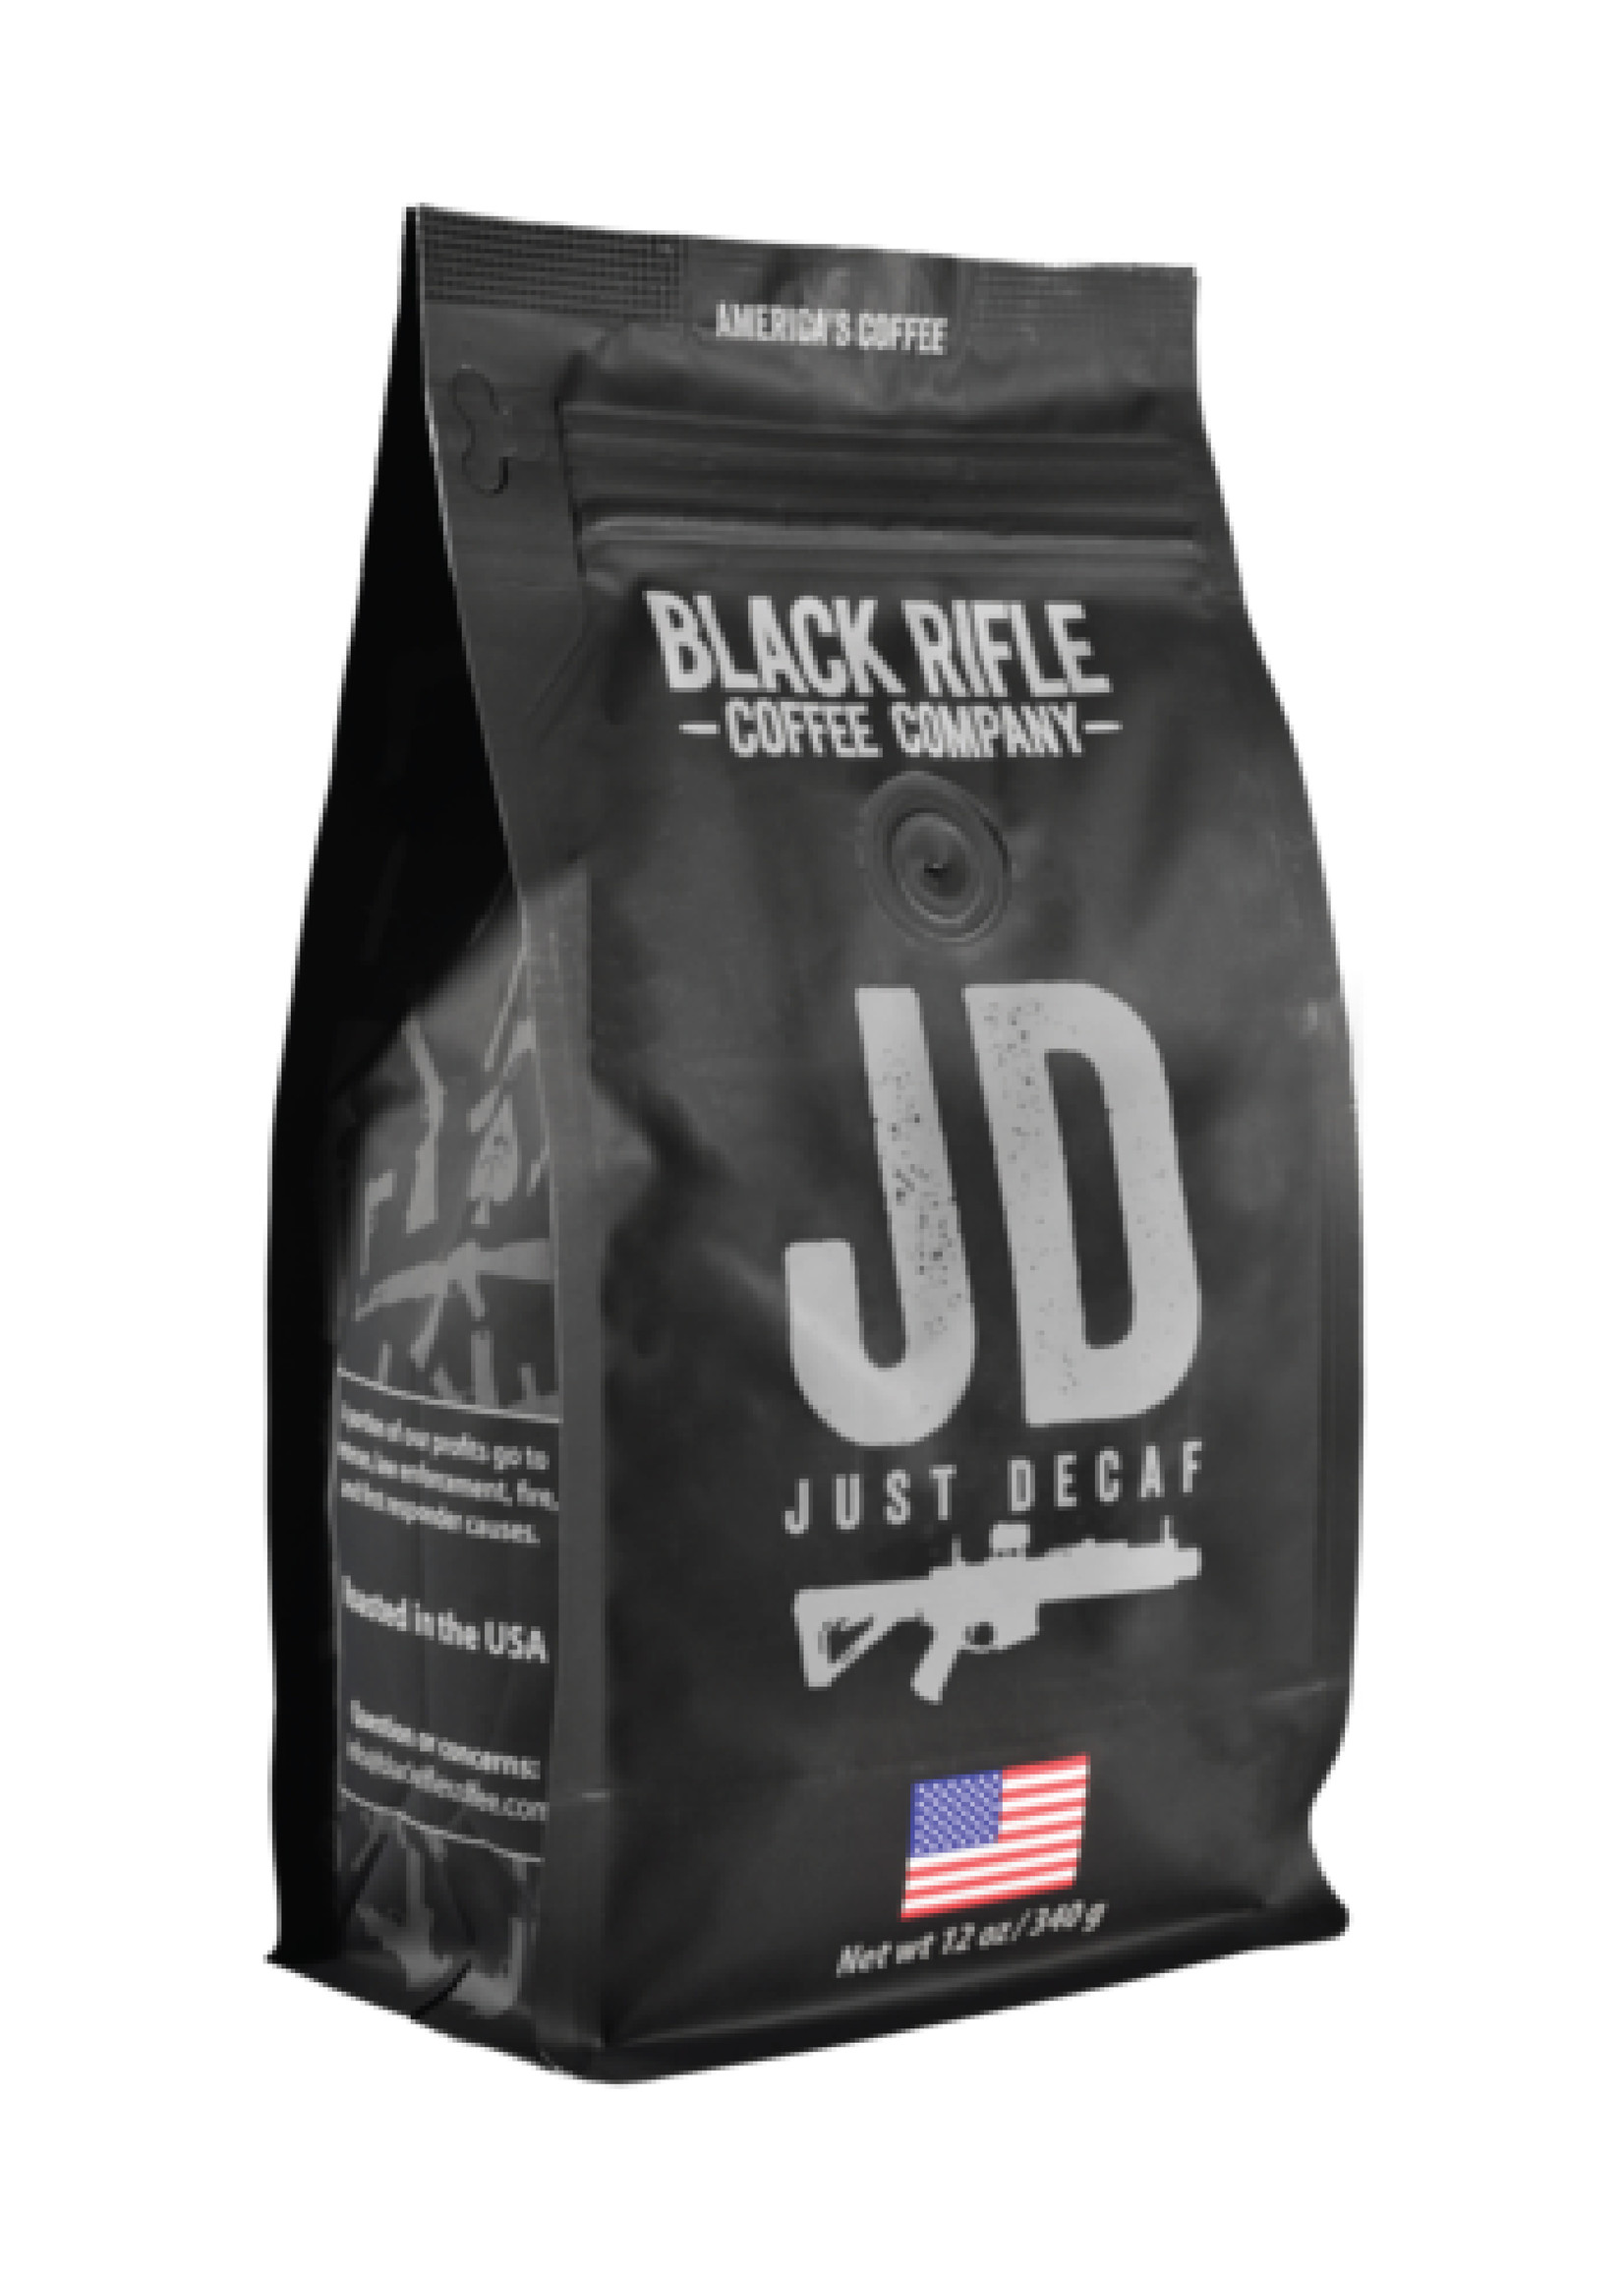 Black Rifle Coffee Company Black Rifle Coffee Company Just Decaf Coffee Roast Ground